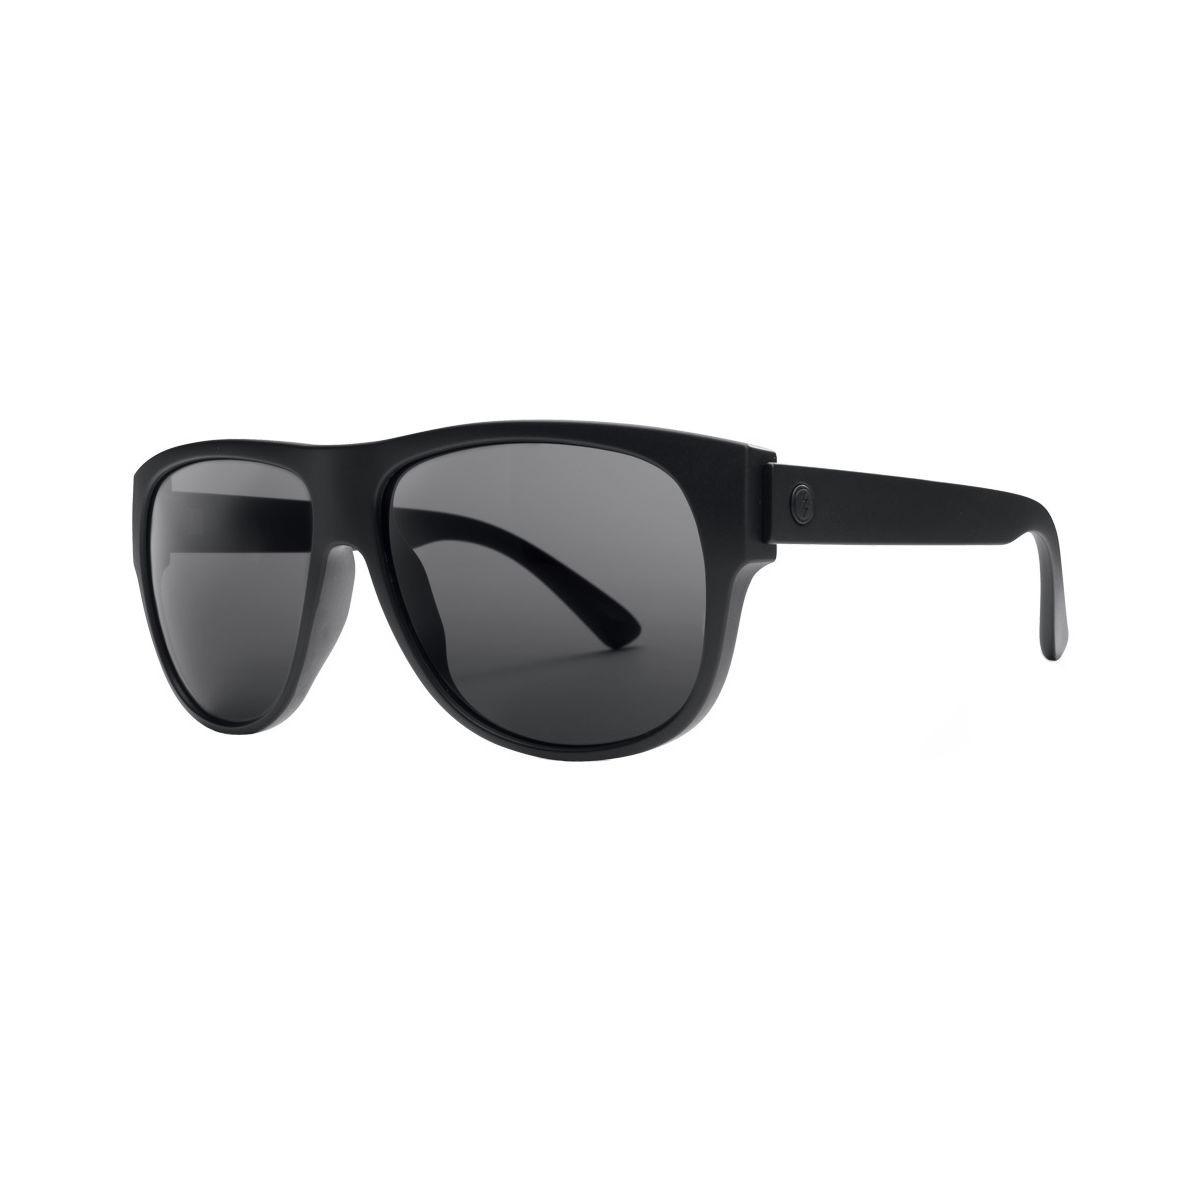 Electric Unisex Adult Mopreme Sunglasses One size  US